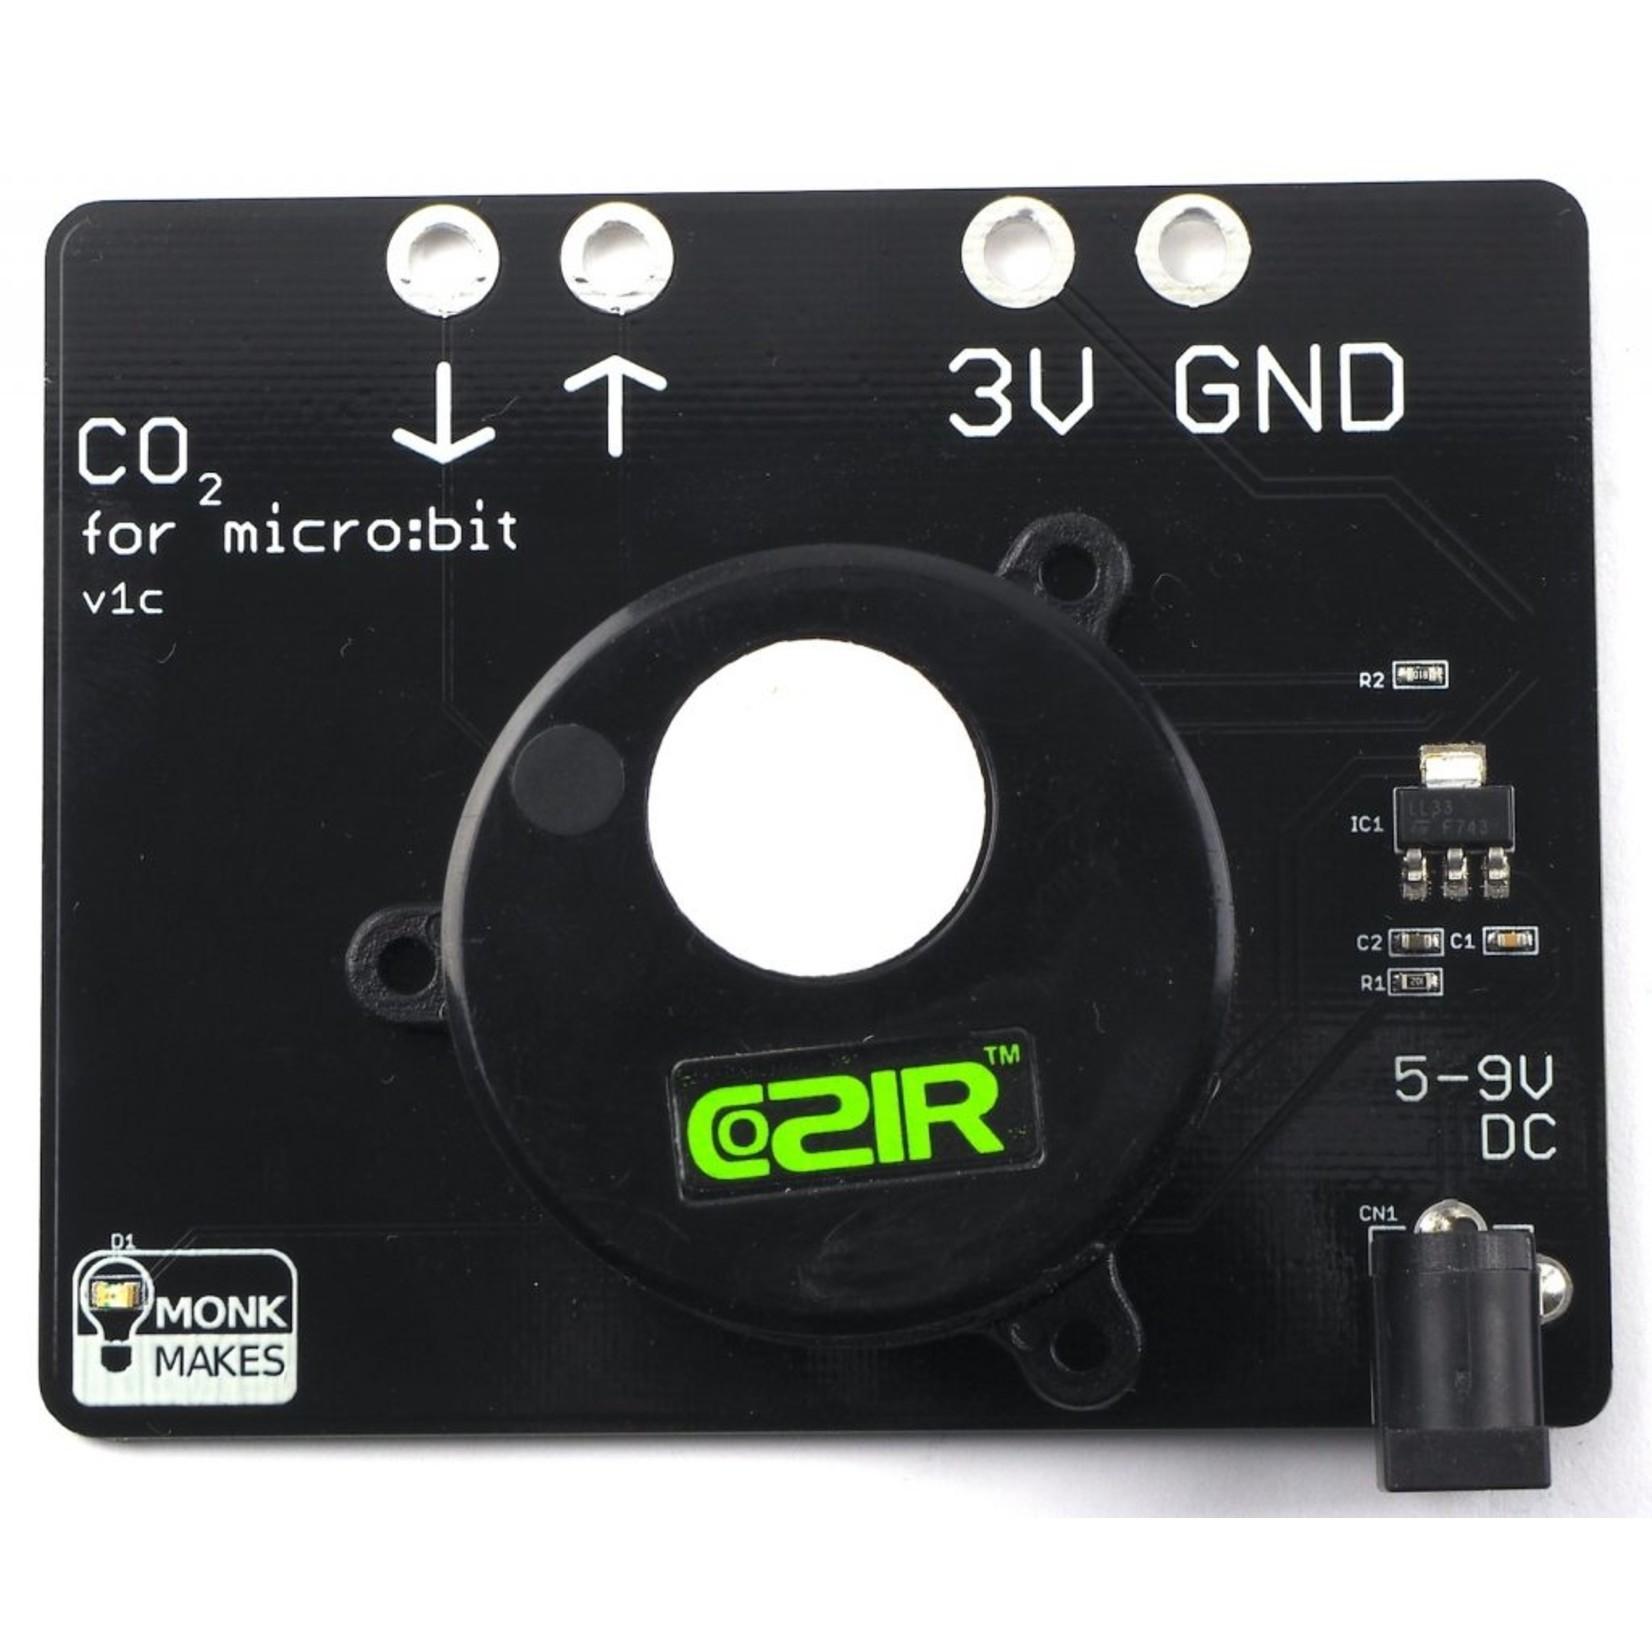 MonkMakes CO2 sensor for micro:bit